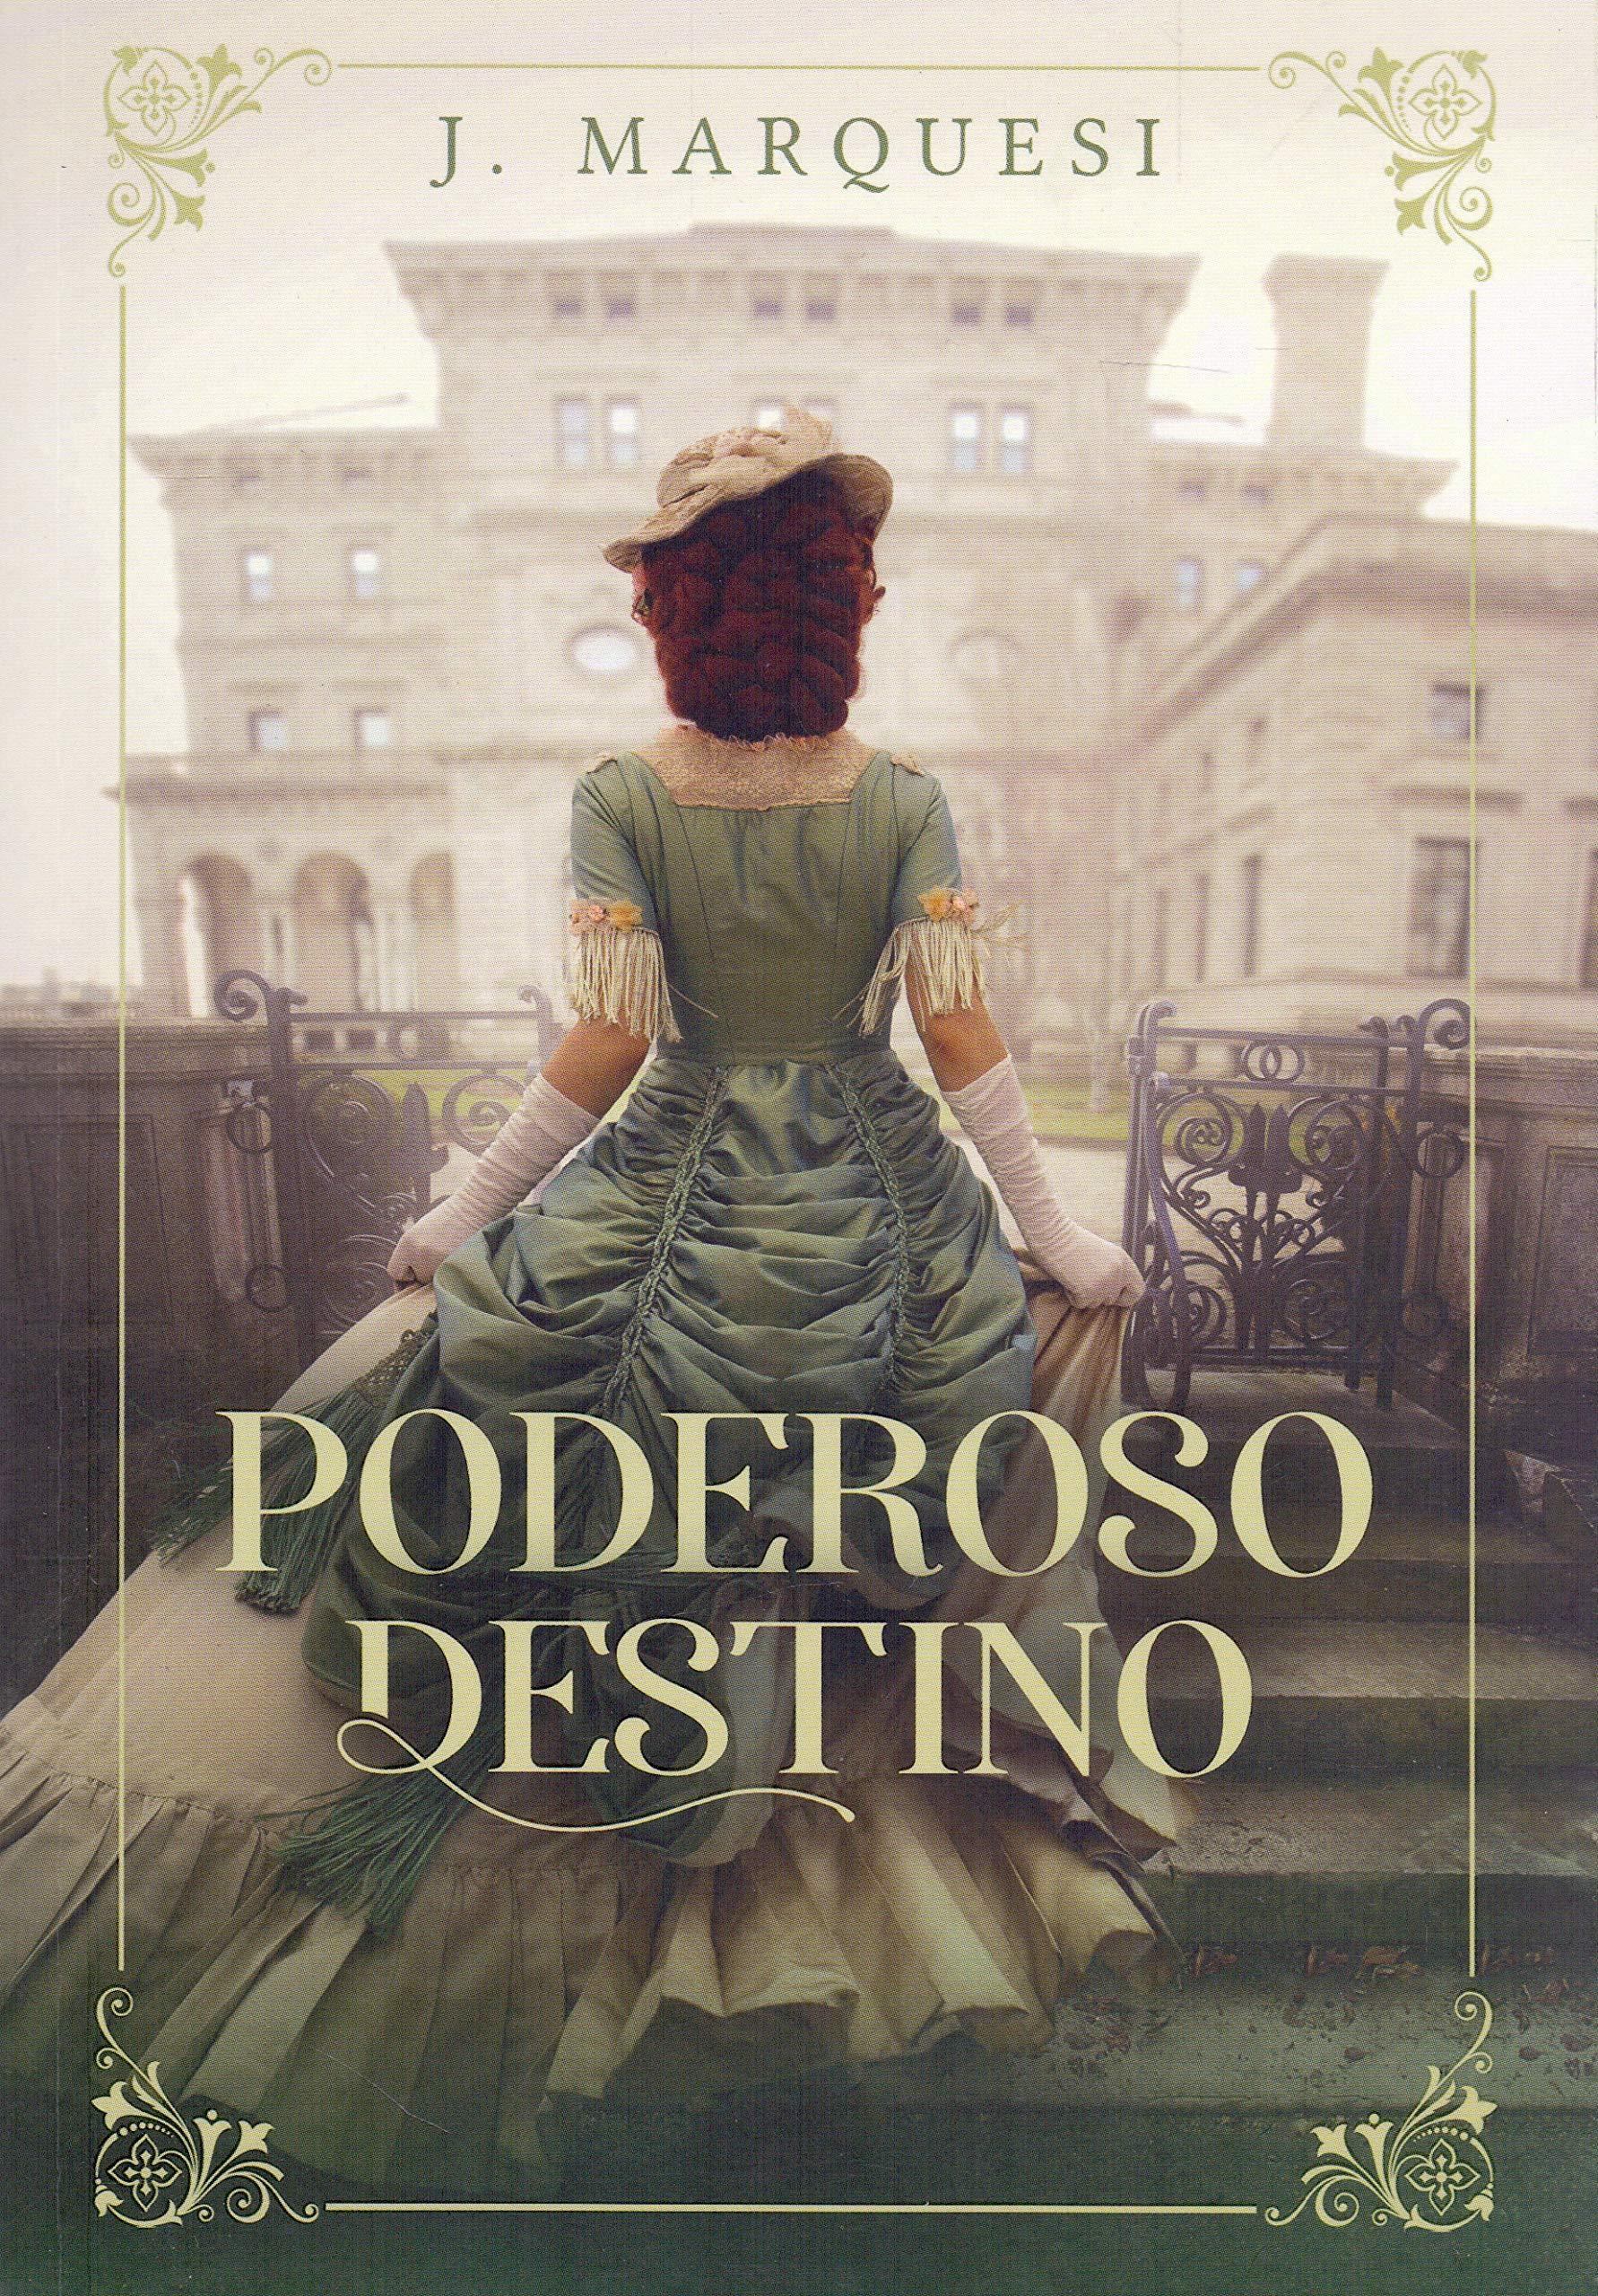 Poderoso destino - Livros na Amazon Brasil- 9788582469712